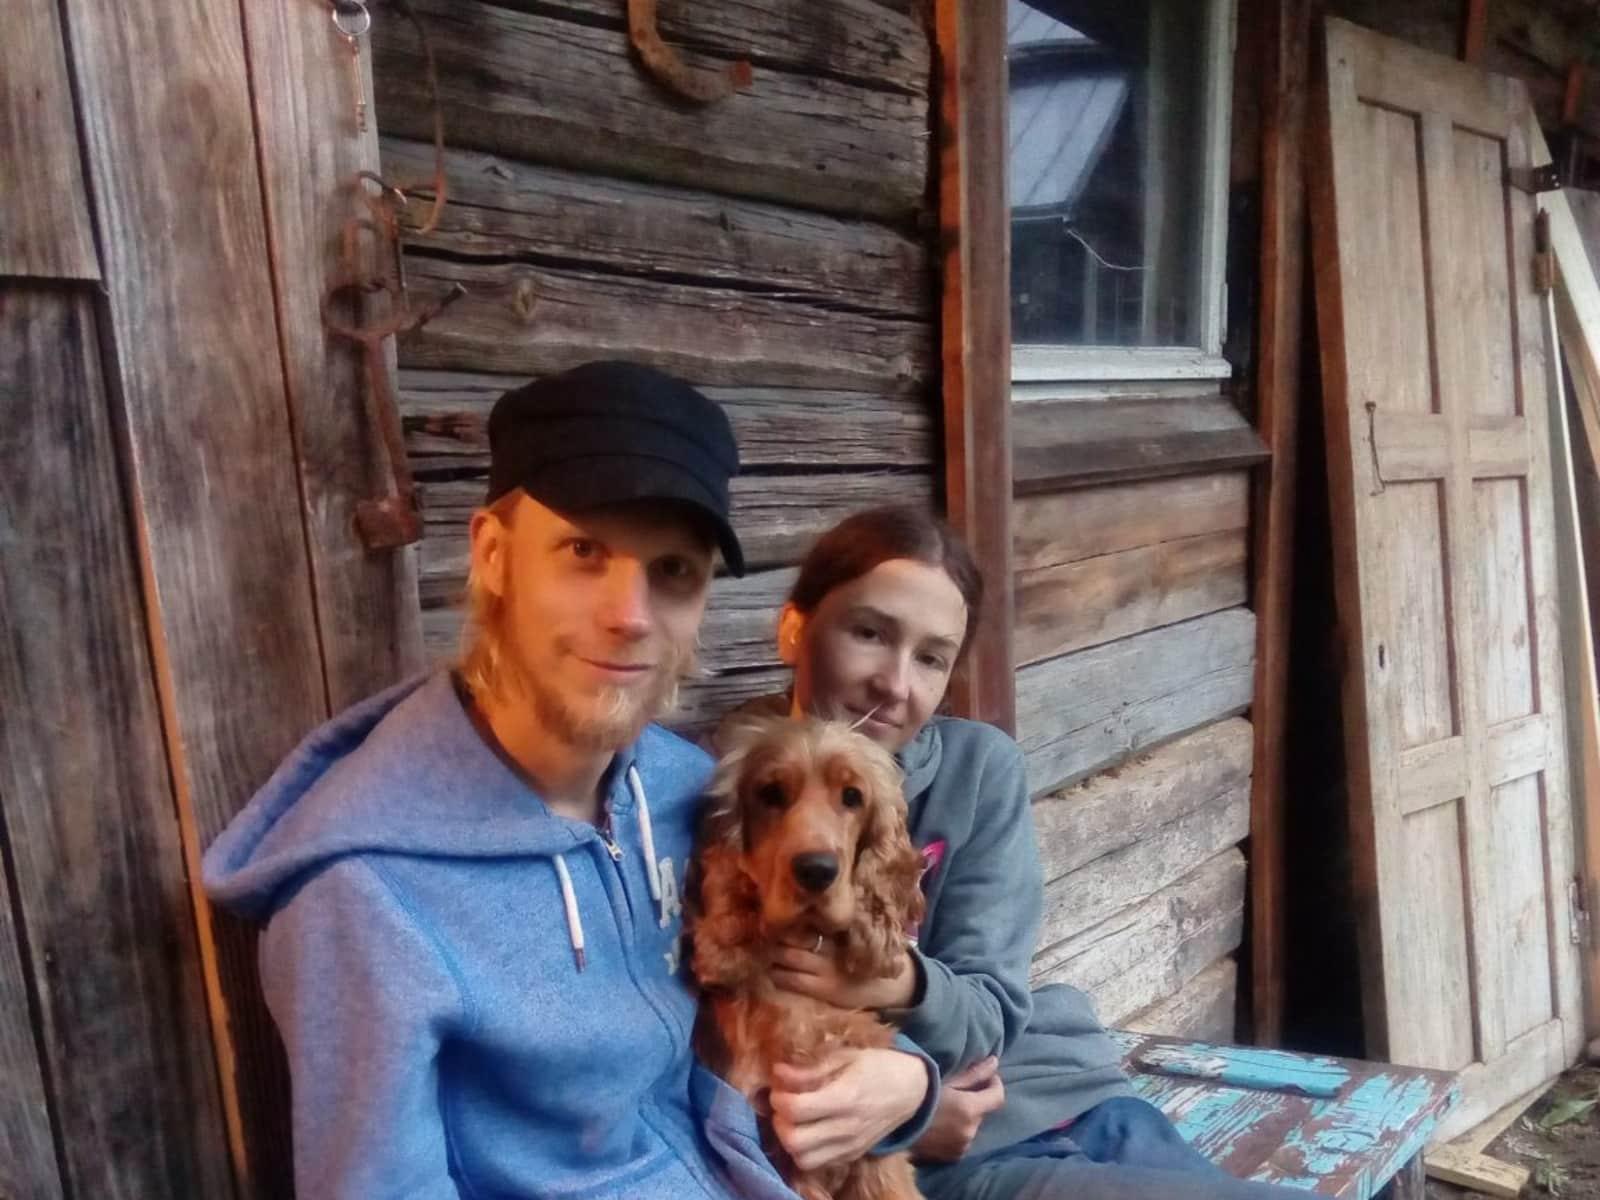 Anna-kaisa & Kalle from Savonlinna, Finland